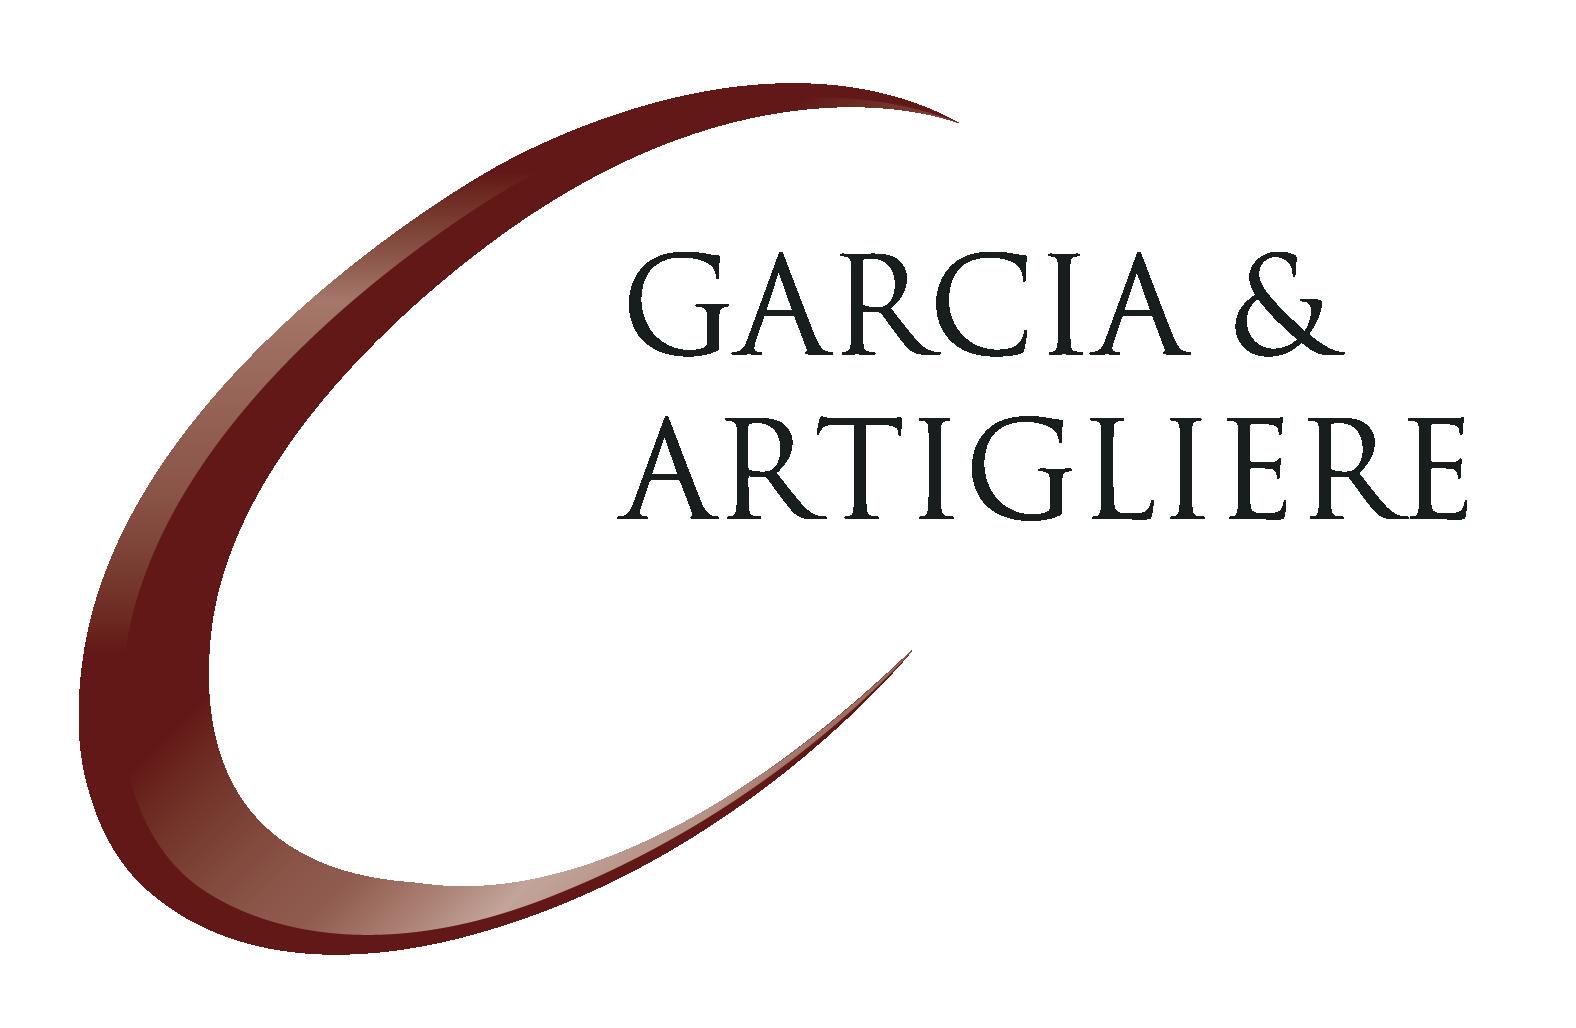 Garcia and Artigliere Logo